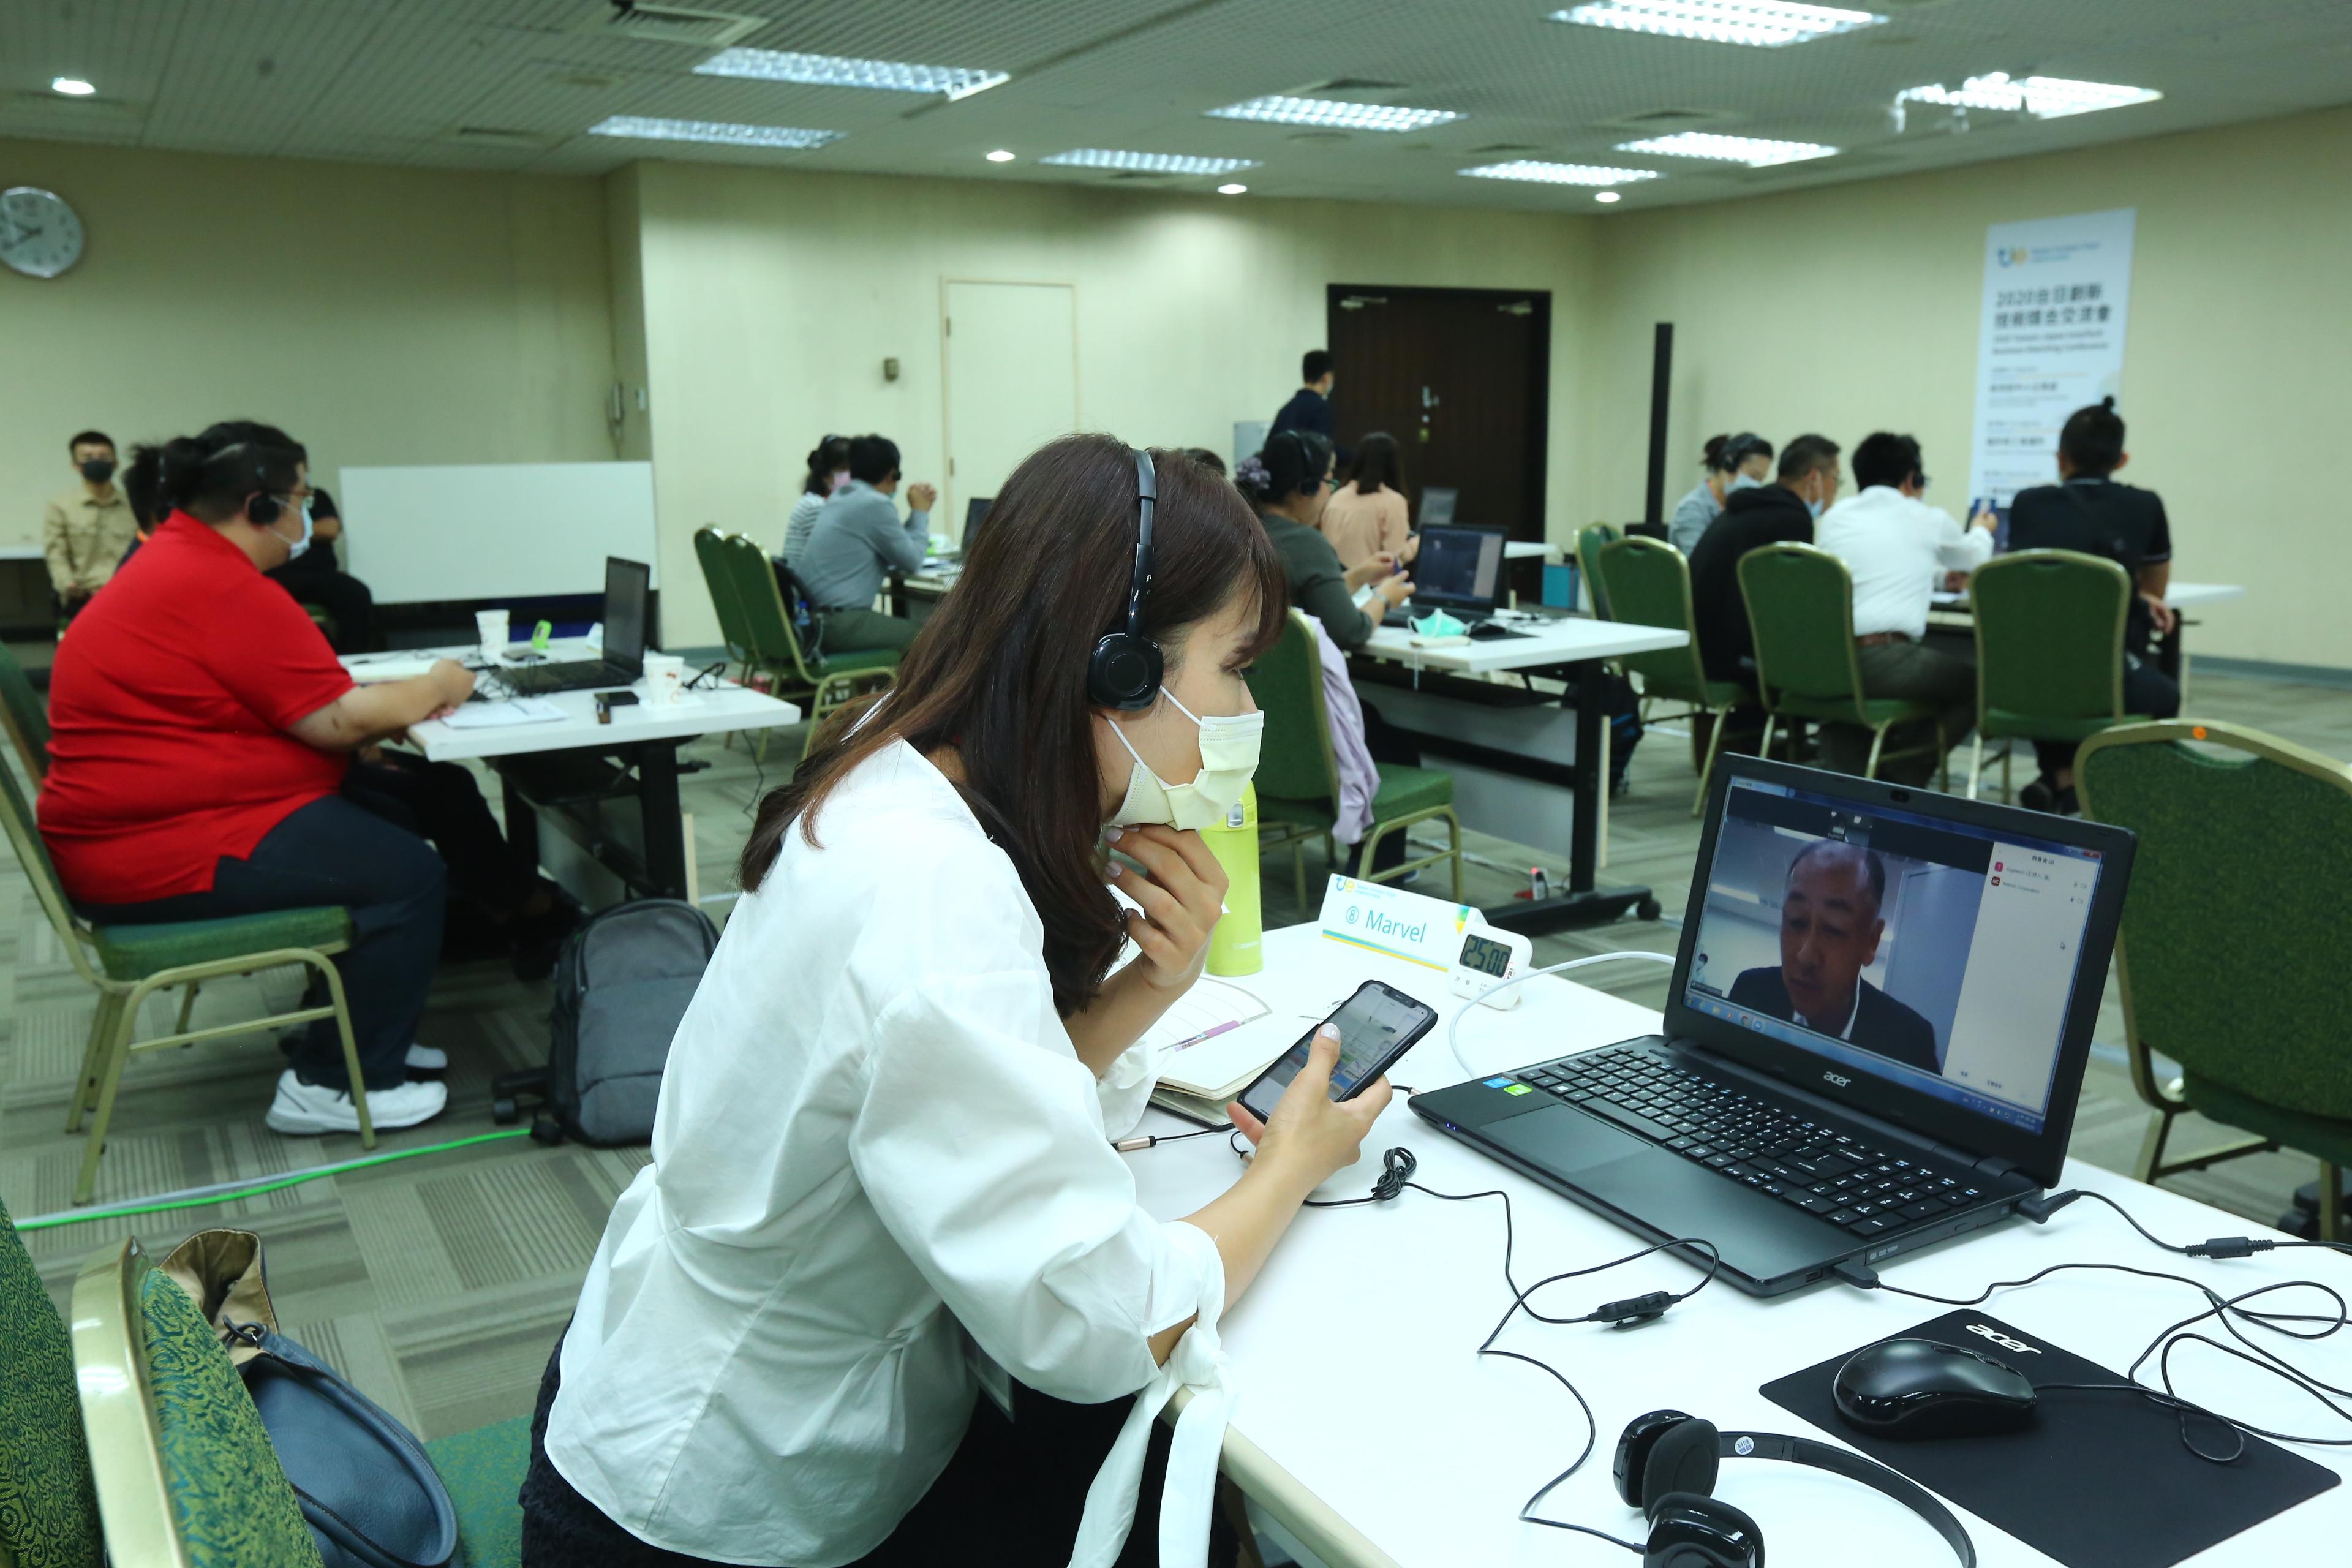 https://storage.googleapis.com/www.taiwantradeshow.com.tw/activity-photo/202009/T-24564337-name.jpg